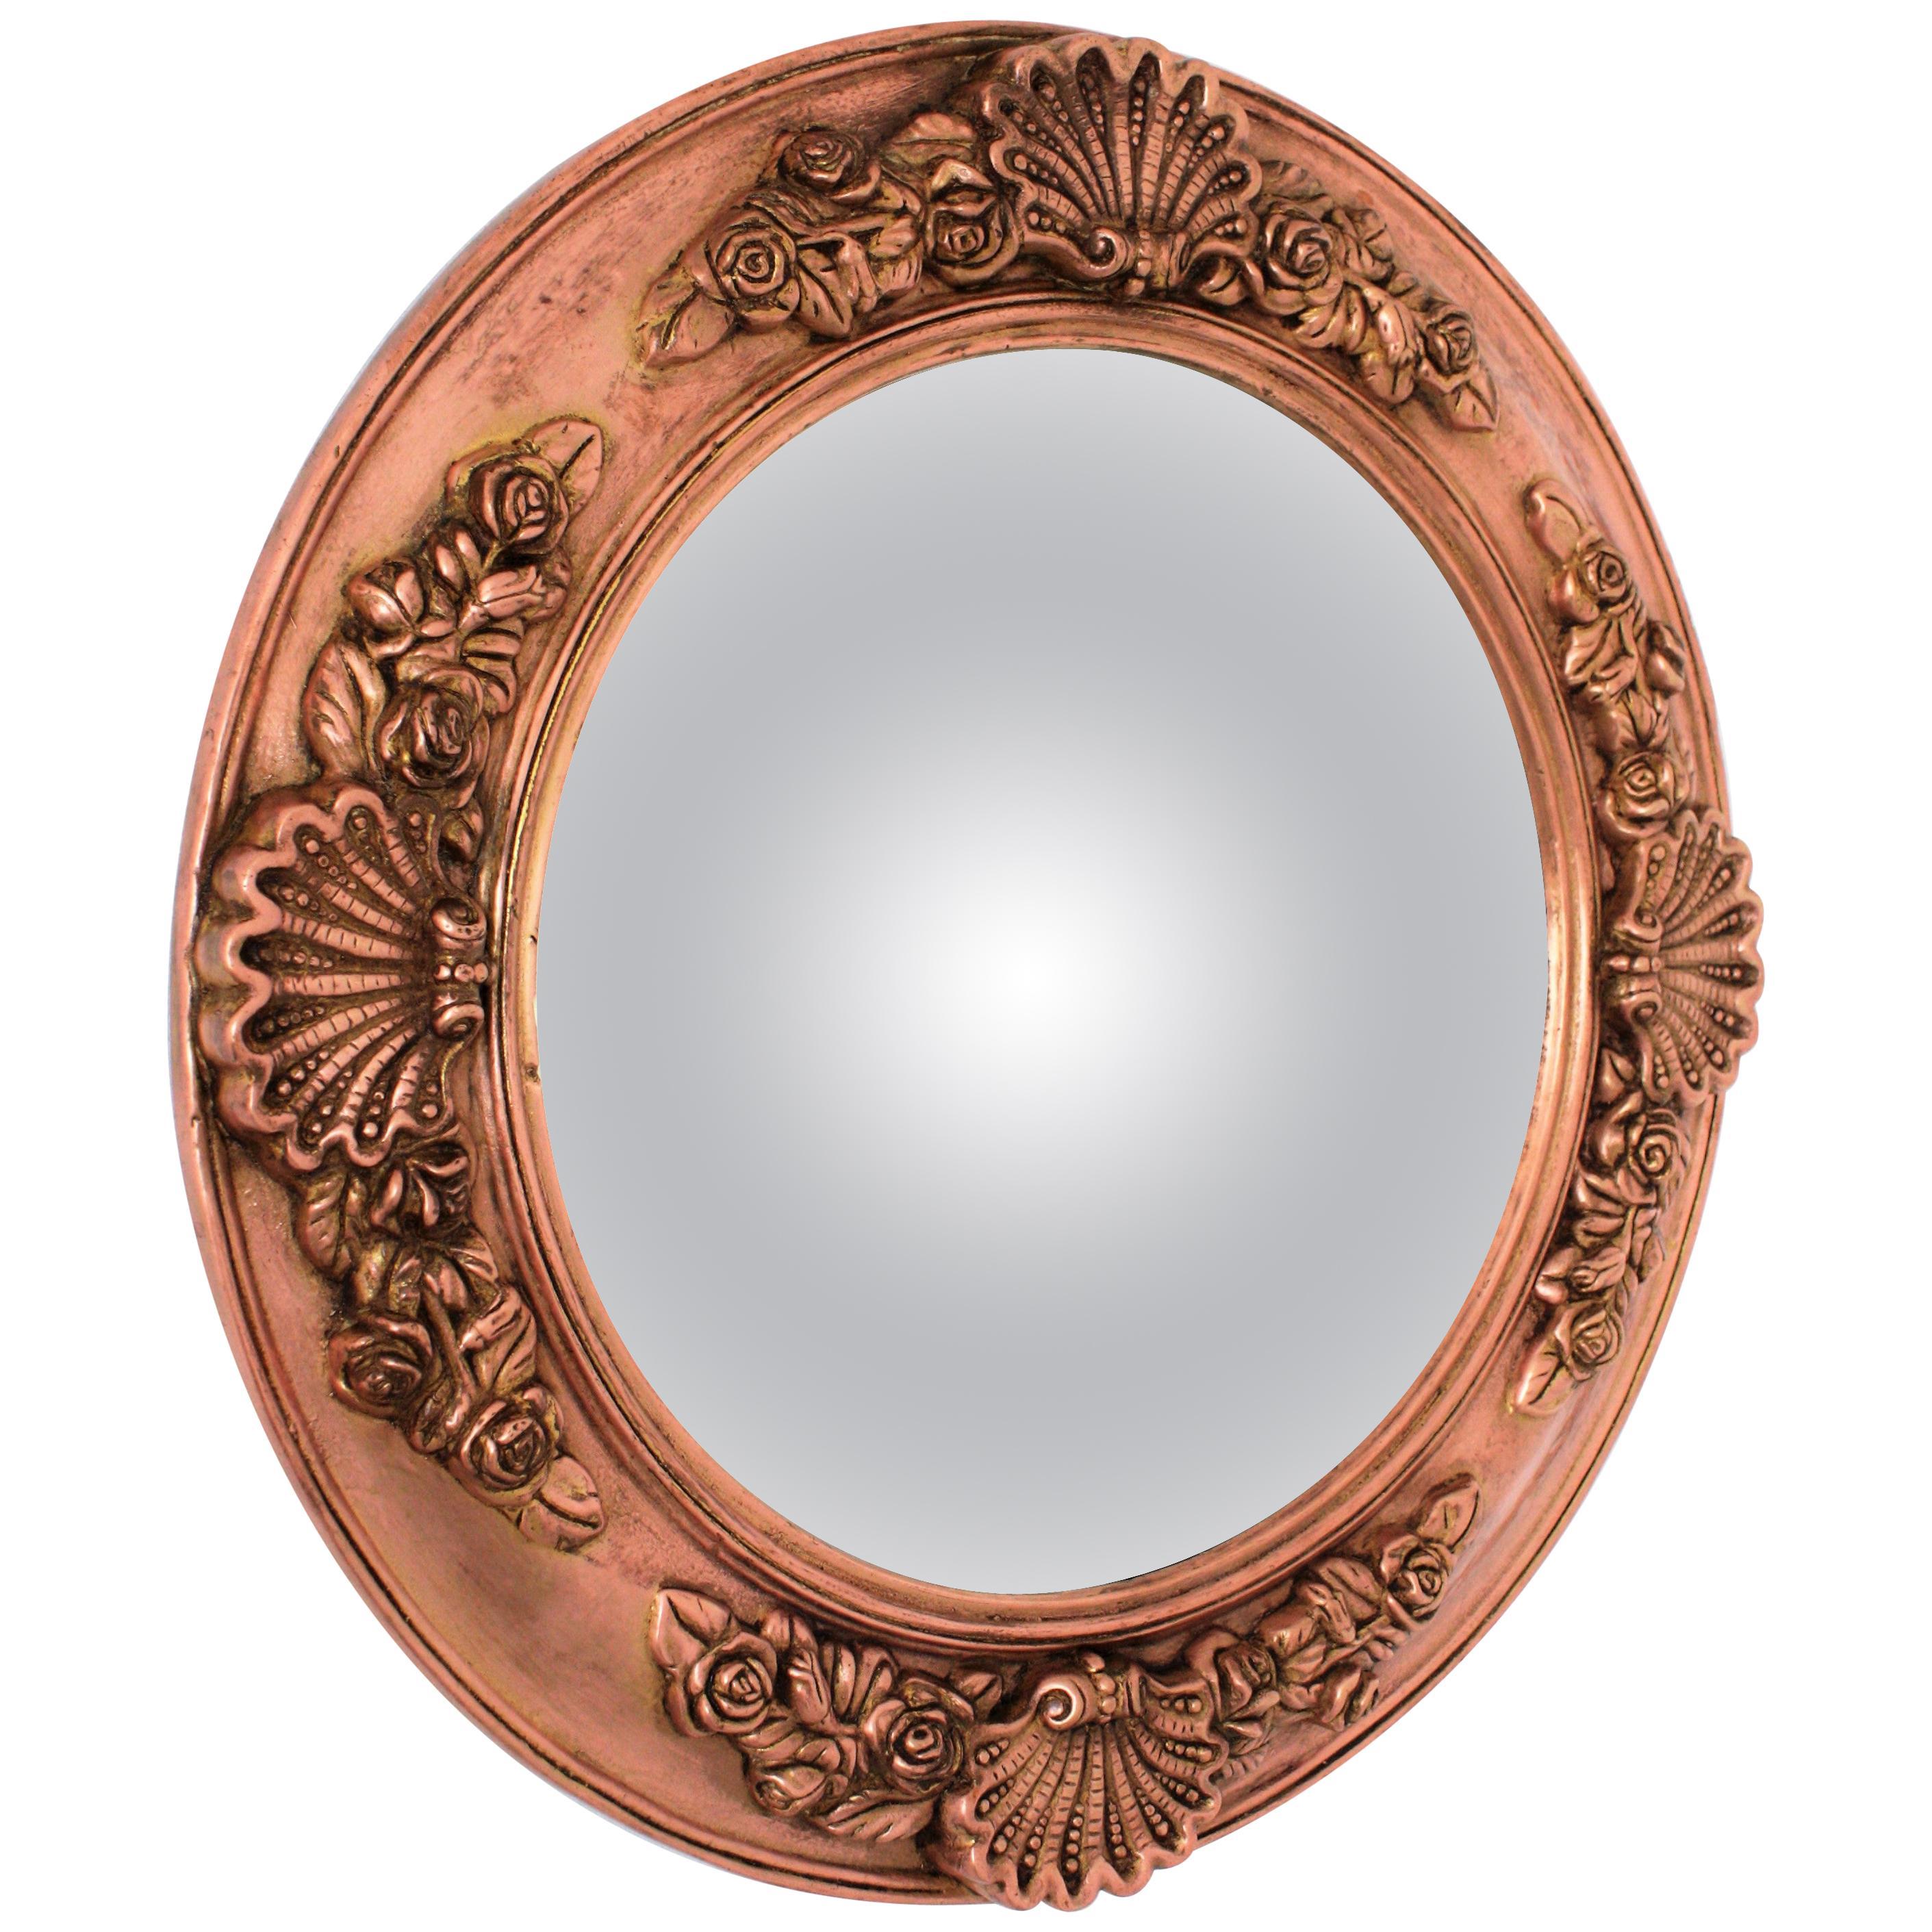 19th Century English Copper Bulls-Eye Convex Mirror